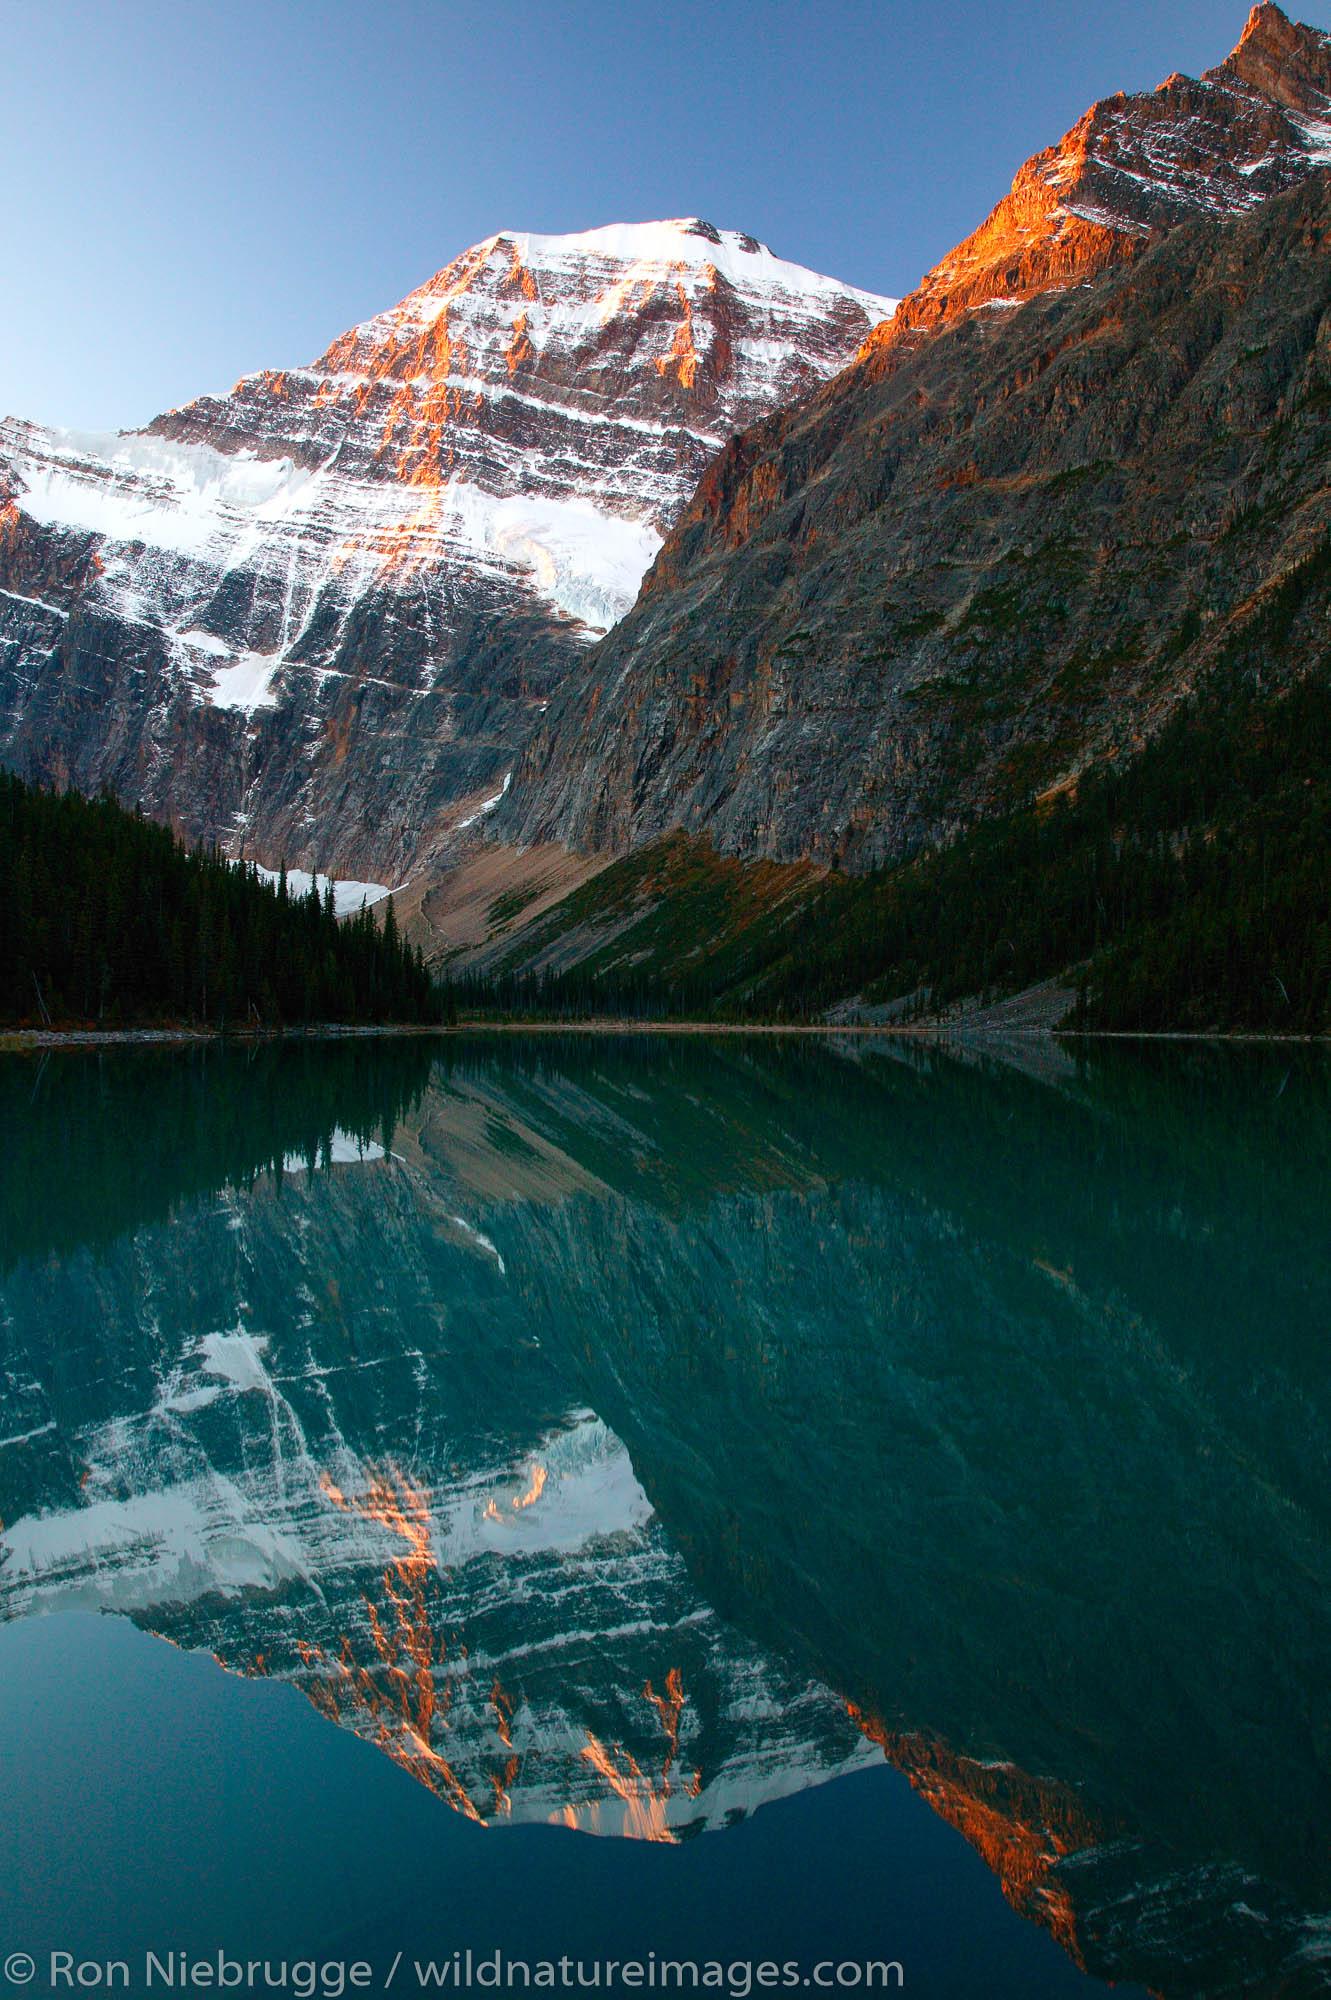 Mt. Edith Cavell reflects into Cavell Lake, Jasper National Park, Alberta, Canada.